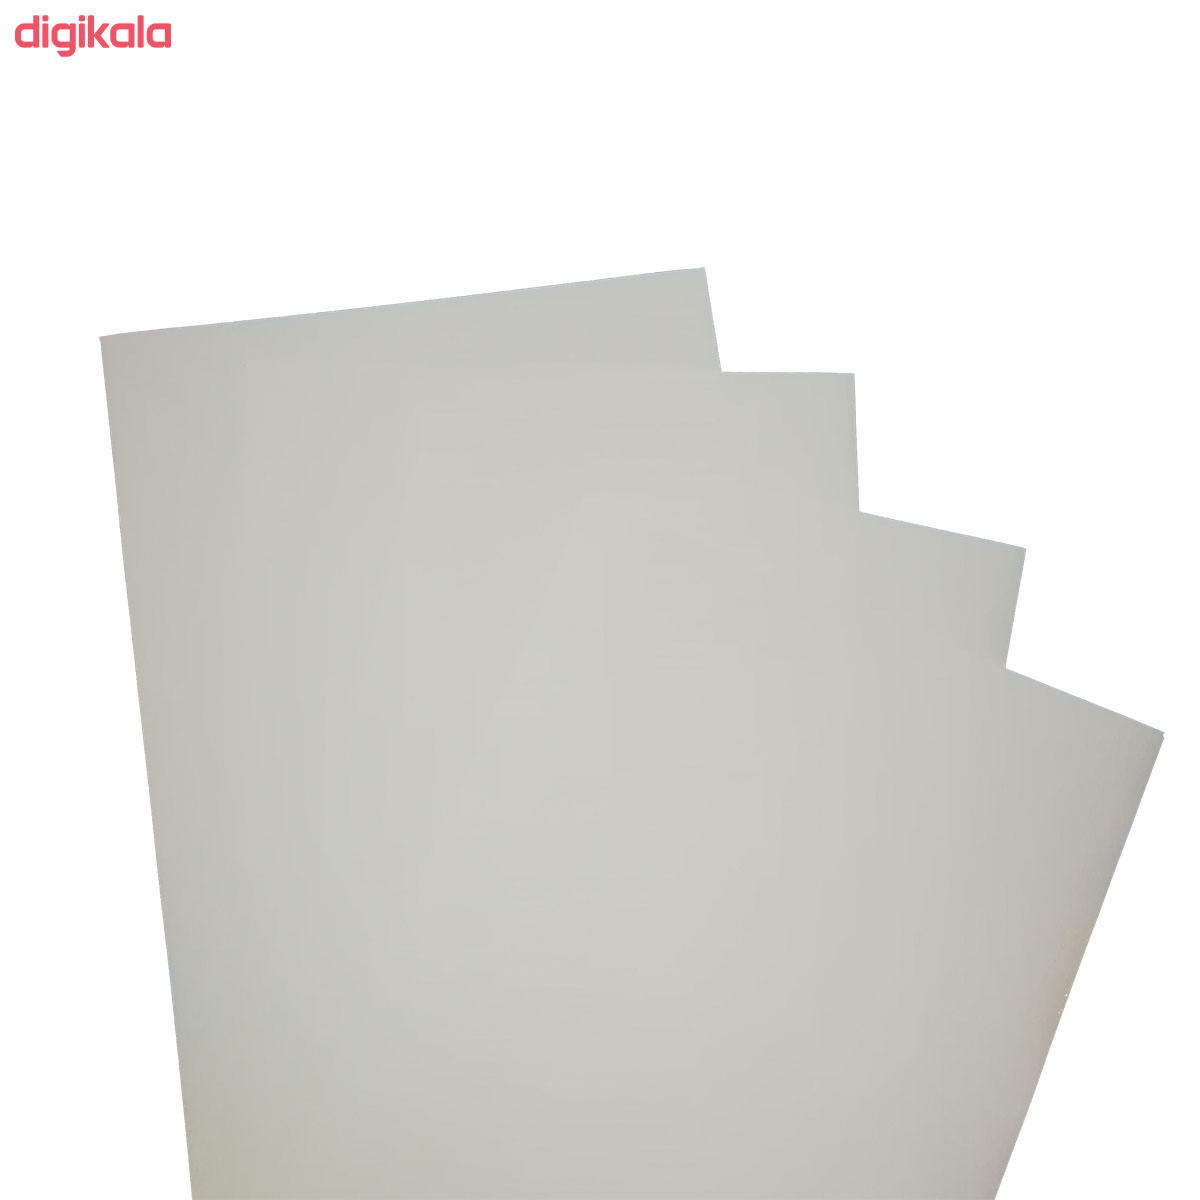 کاغذ چاپ رفیق مدل 102 سایز A4 بسته 20 عددی main 1 3